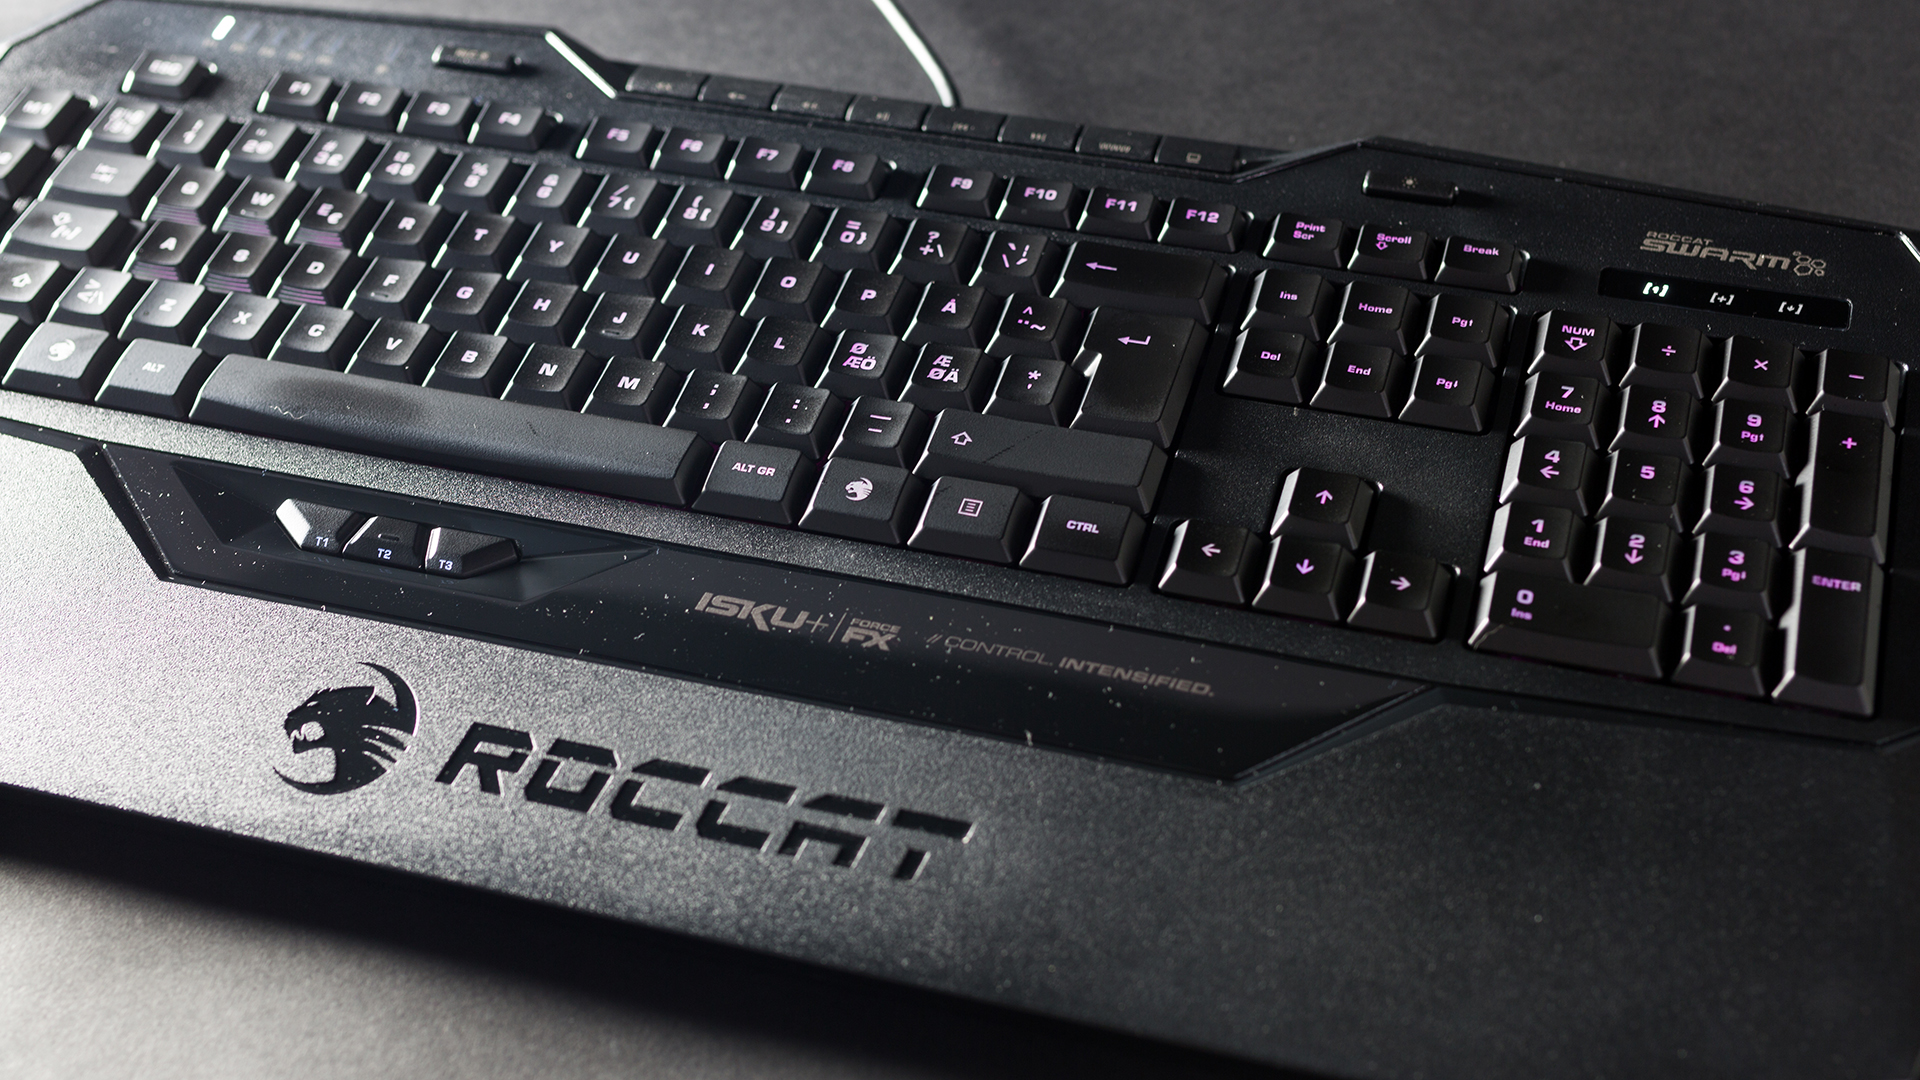 Roccat Isku+ Force FX